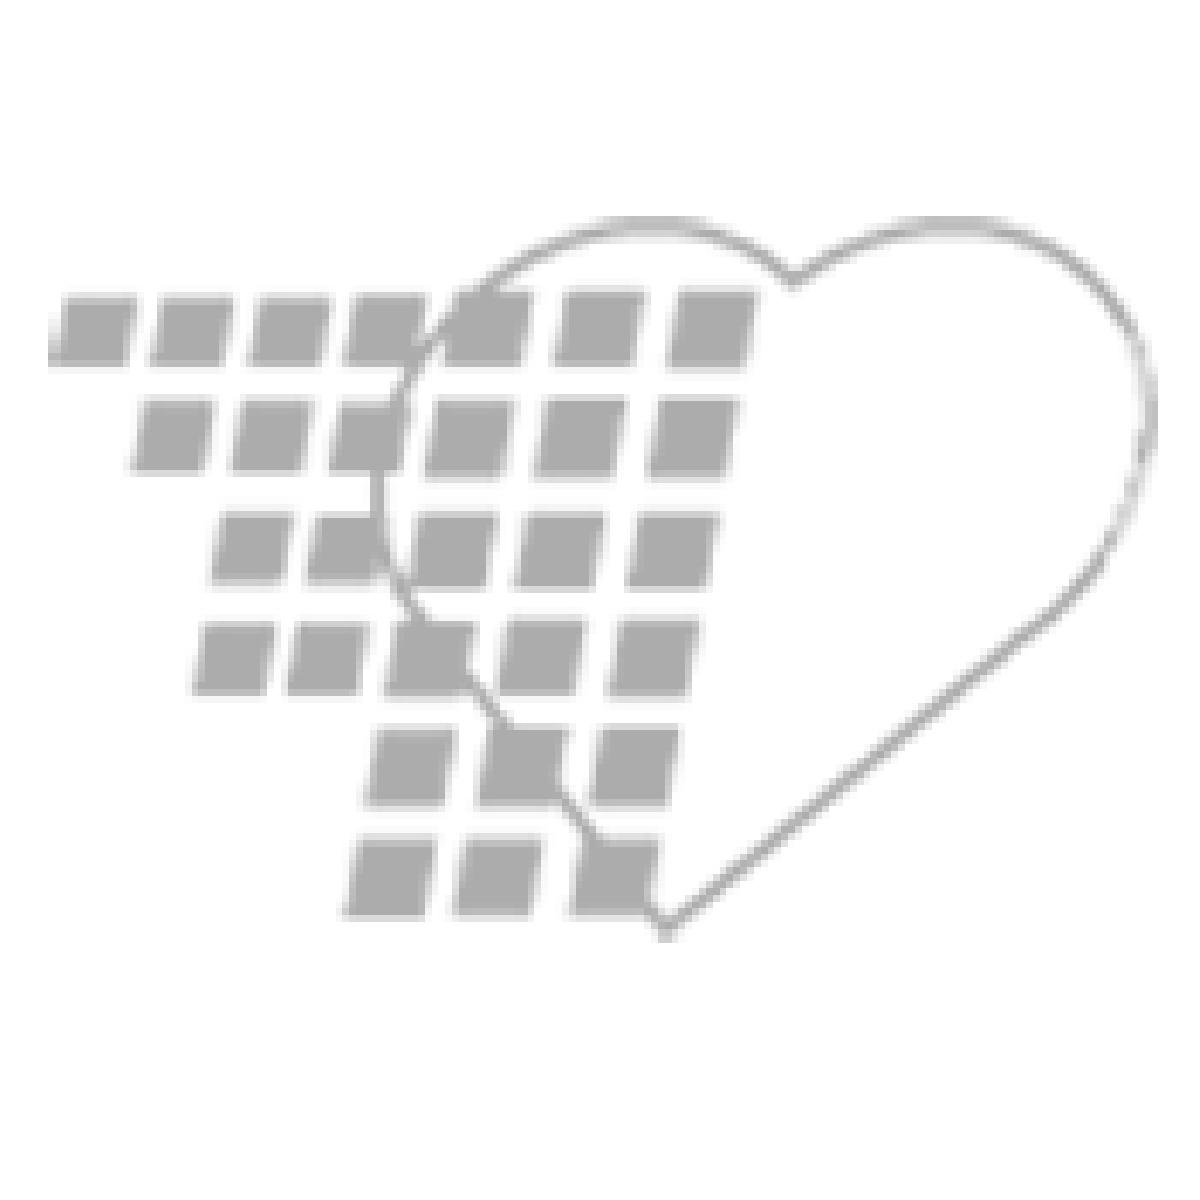 06-93-0308 - Demo Dose®Long Term Lopressr 50 mg Medication Pack